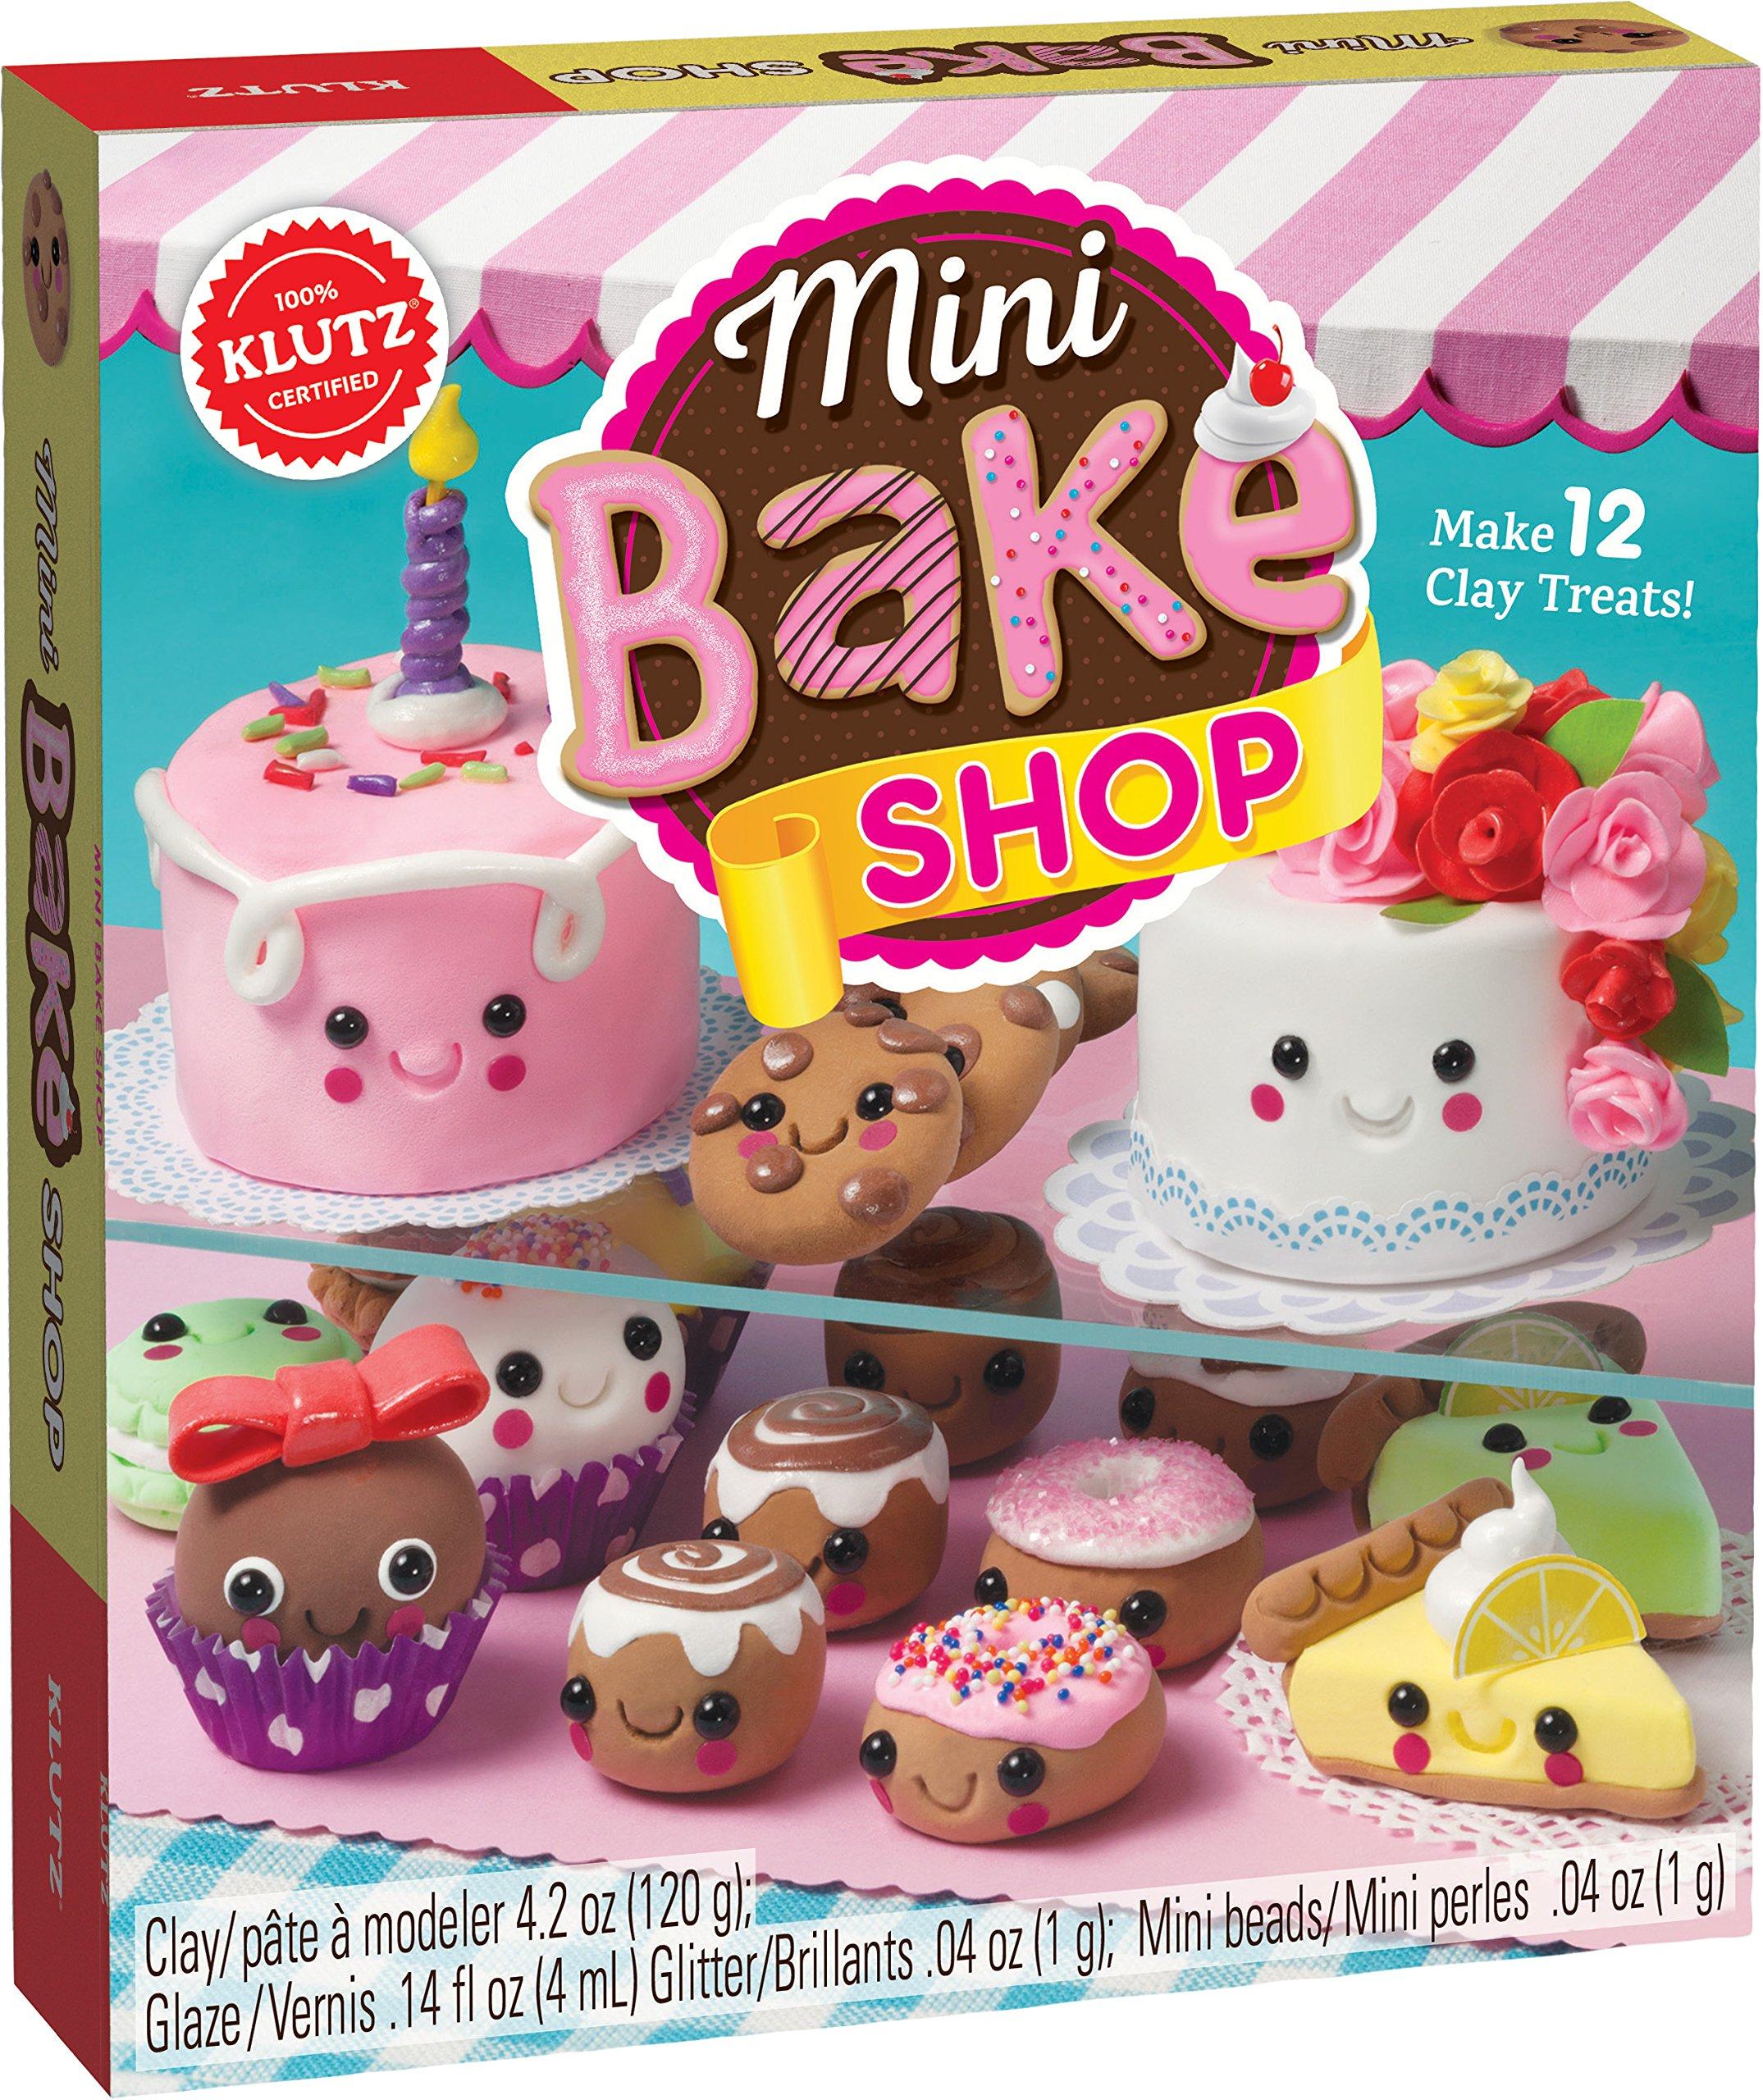 Klutz Mini Bake Shop by Klutz